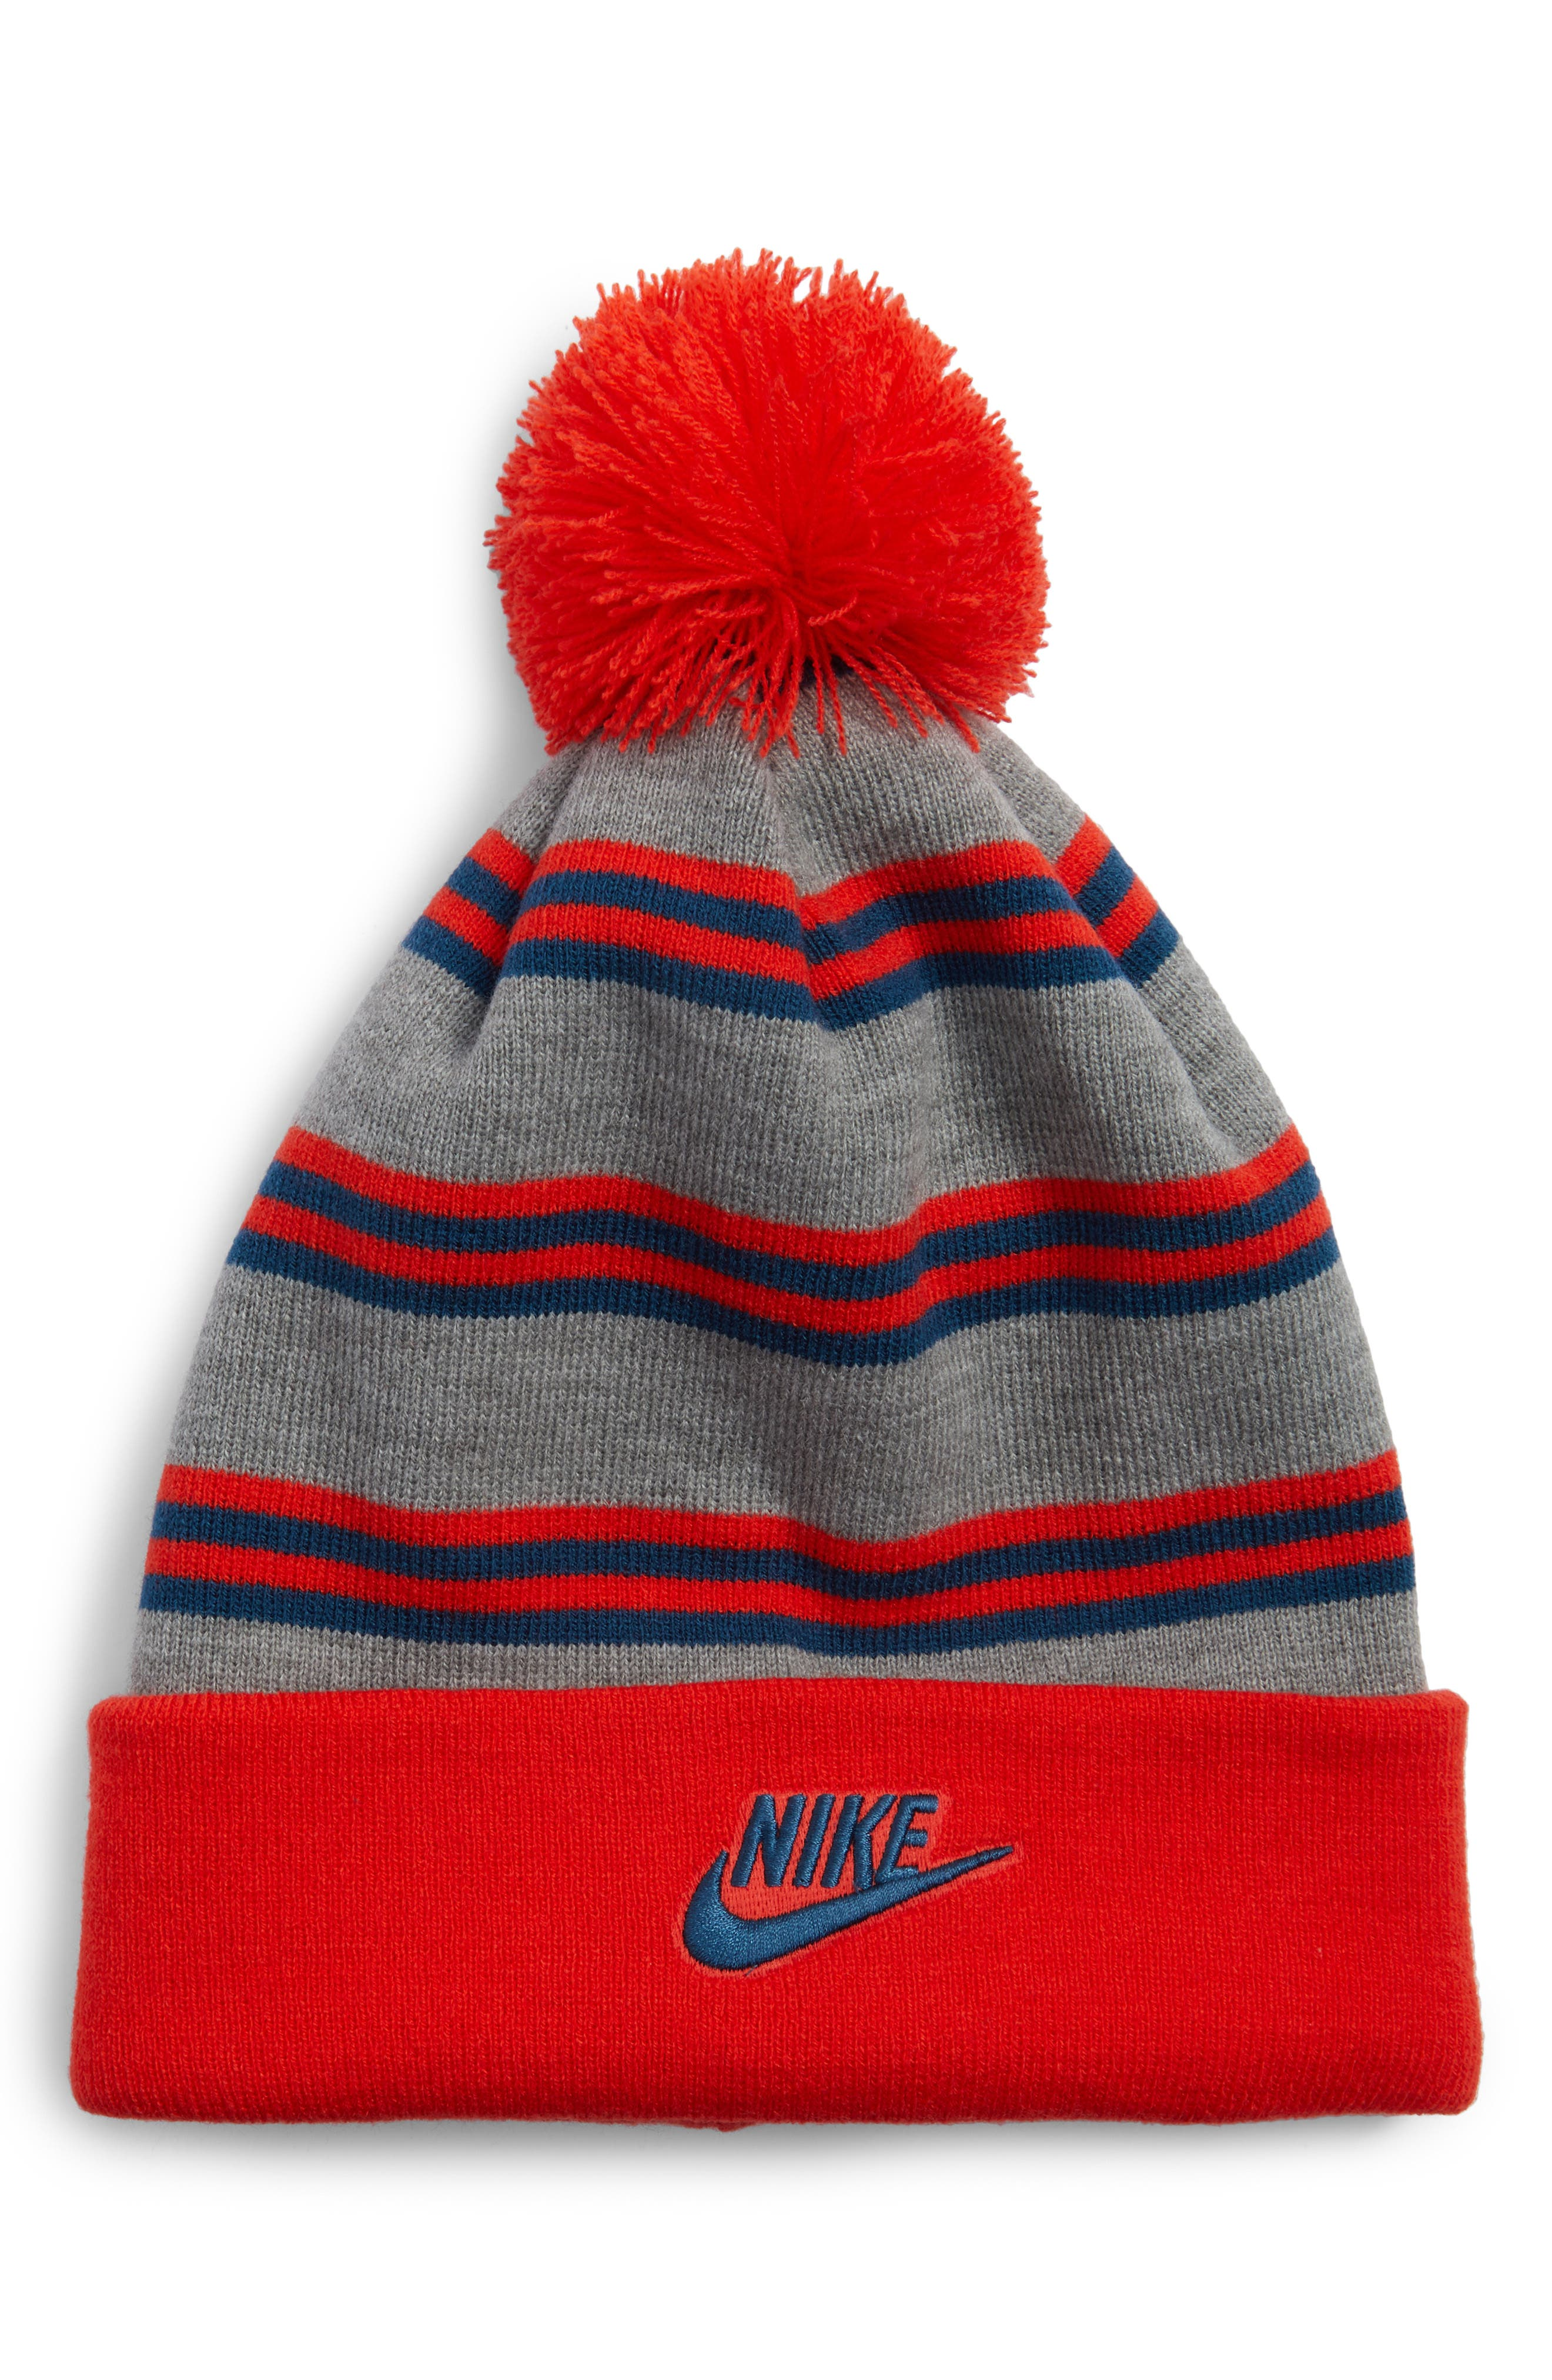 online retailer c288a b78bd ... canada nike sportswear womens beanie 61310 92fdc